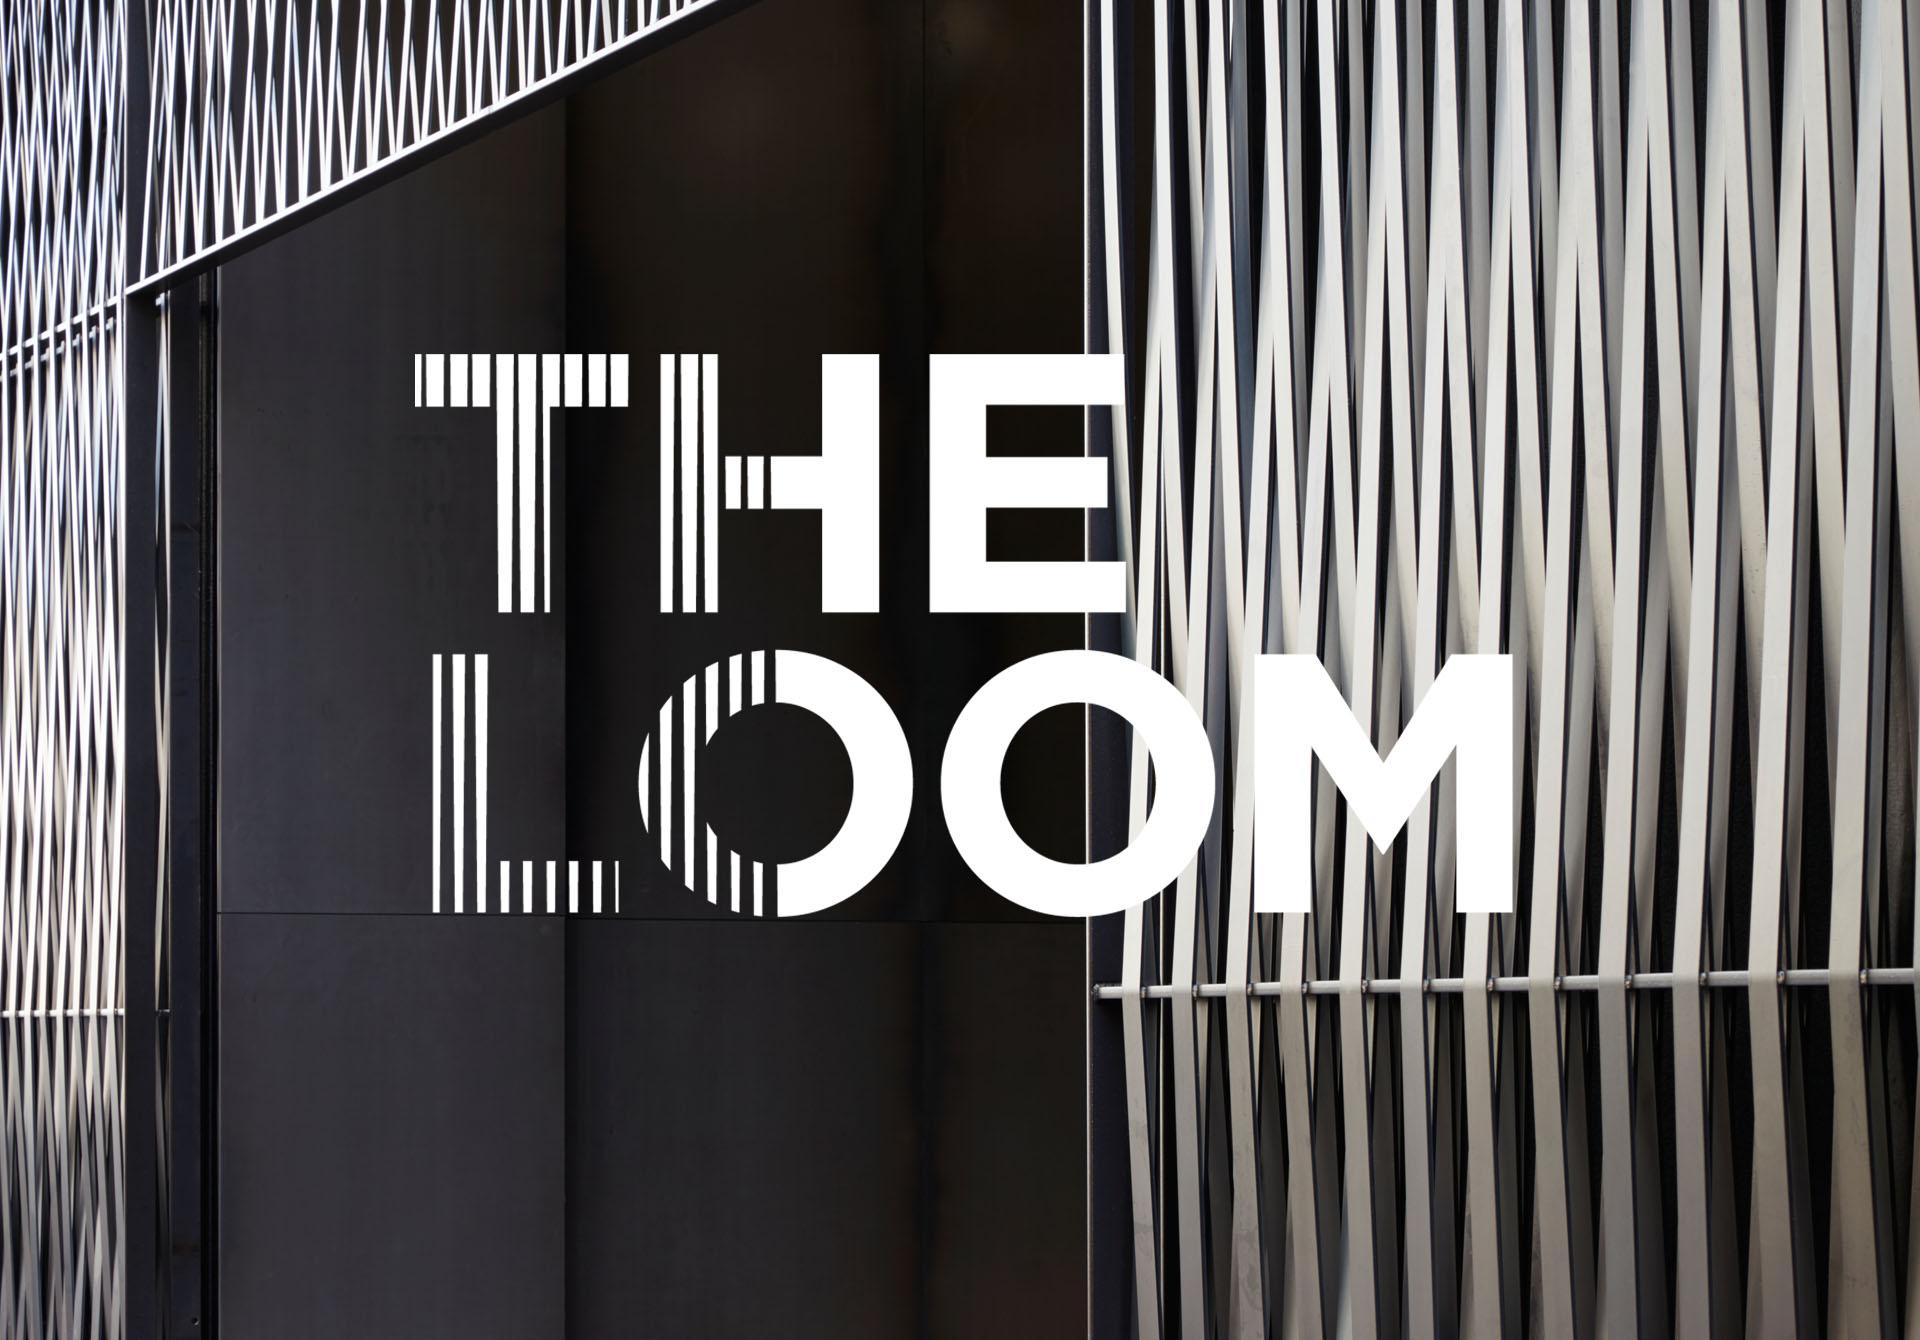 1-The Loom